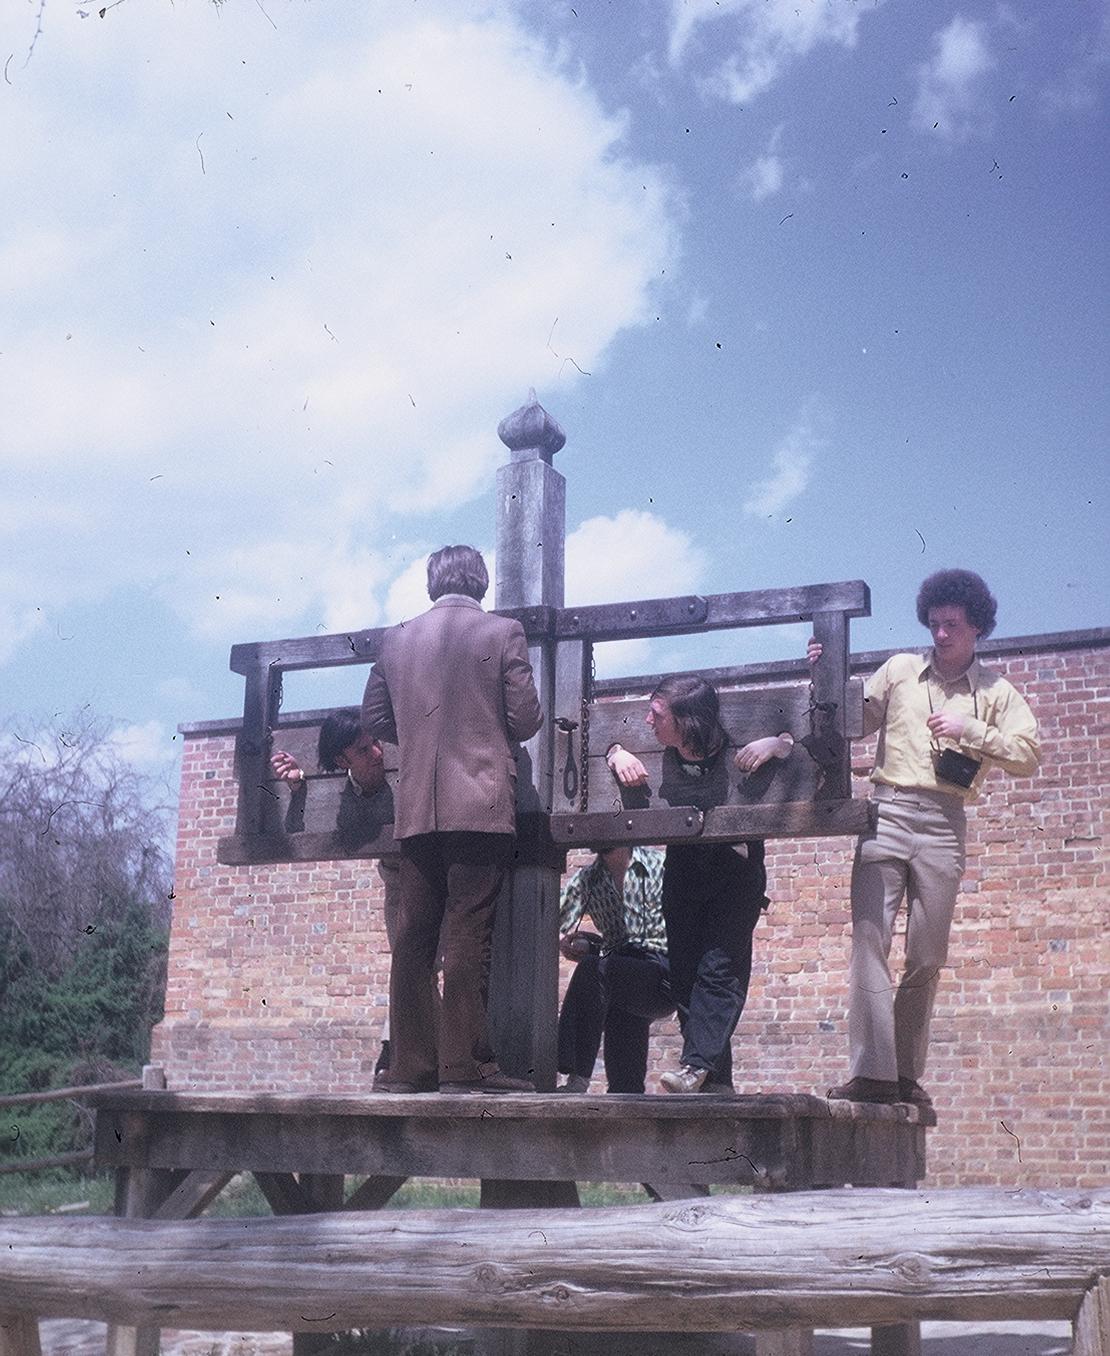 Spring_tour_1973_Willamsburg_staudt4-R1-E020.jpg